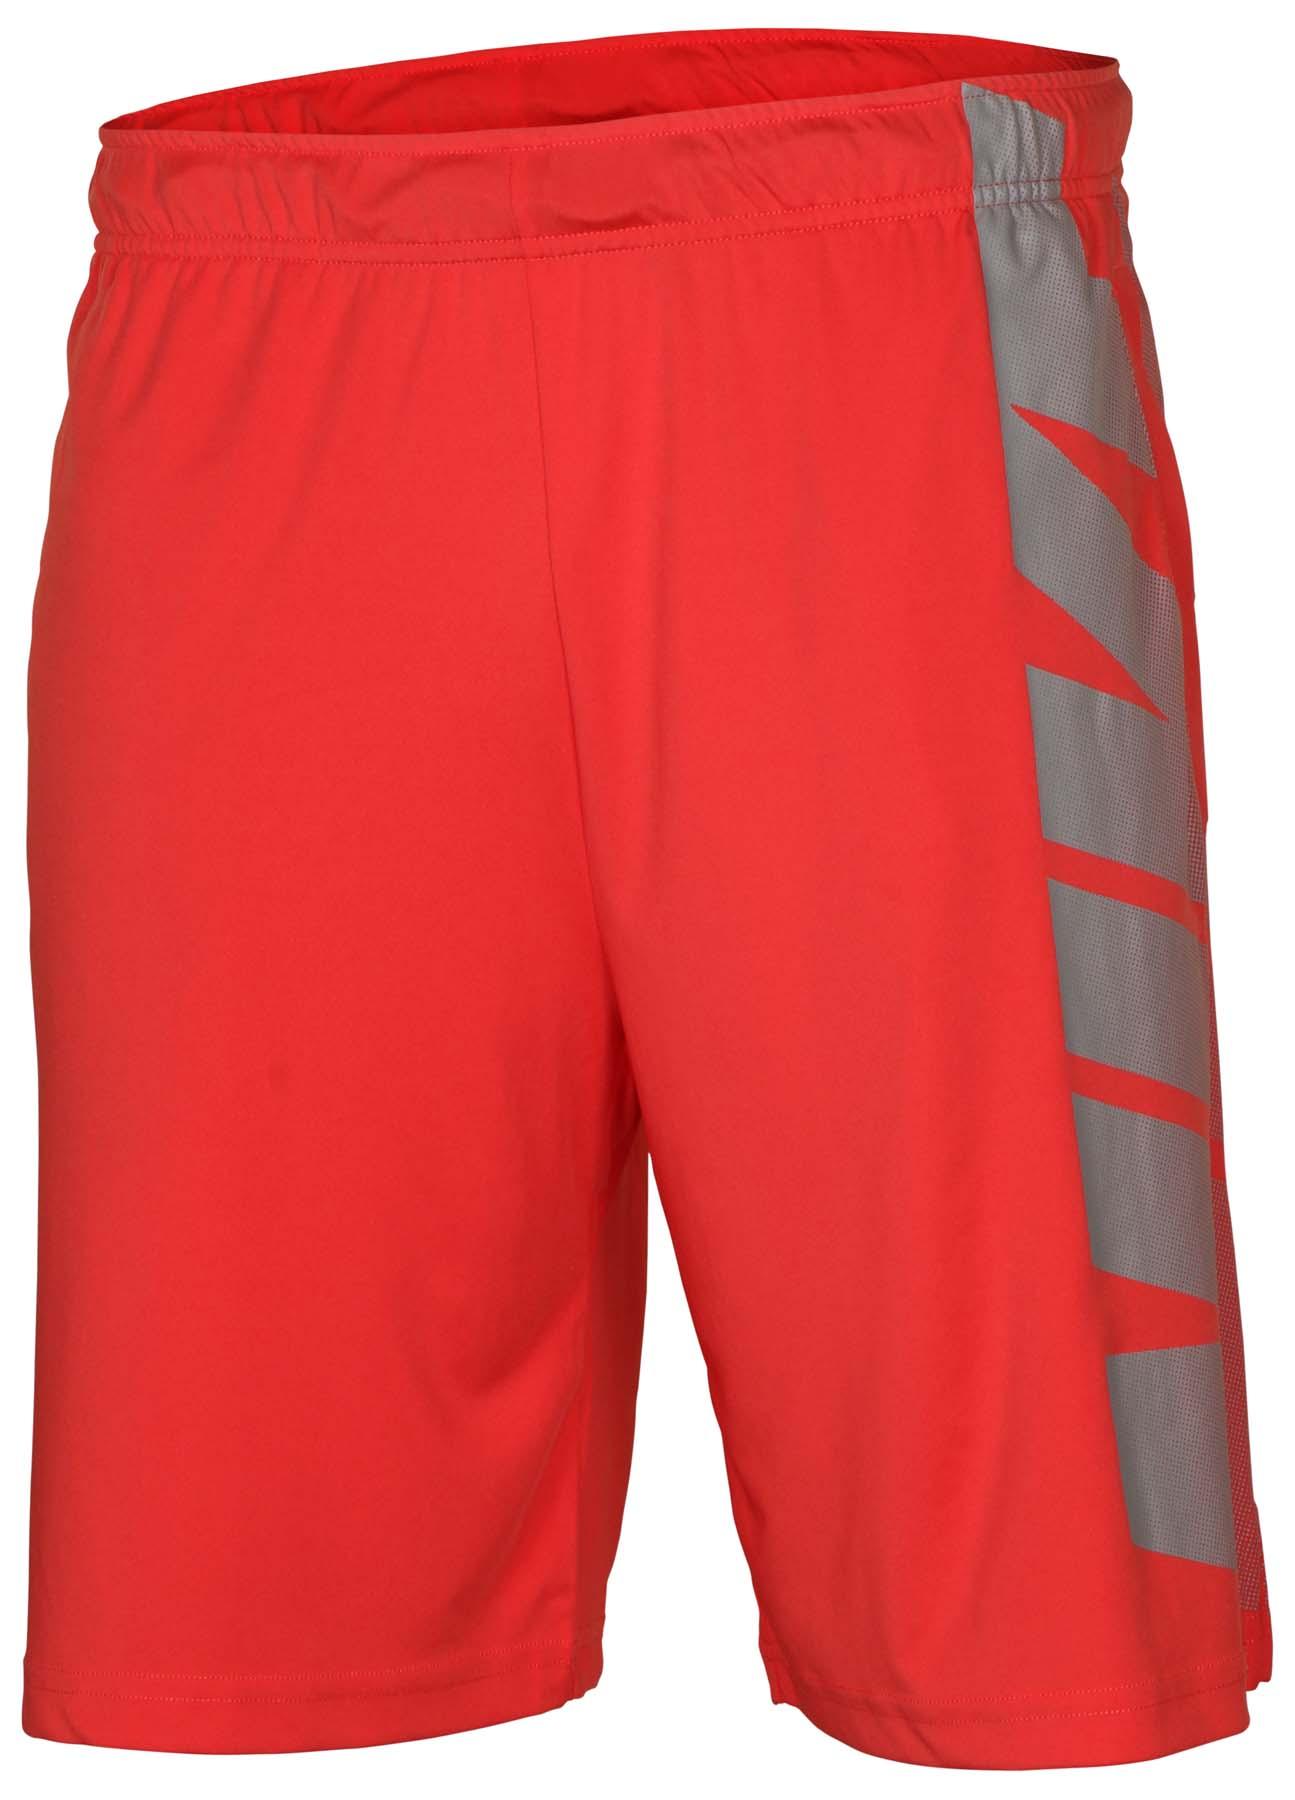 Nike mens dri fit short block training shorts ebay jpg 1295x1800 Red nike  dri fit shorts 537c3e7fe